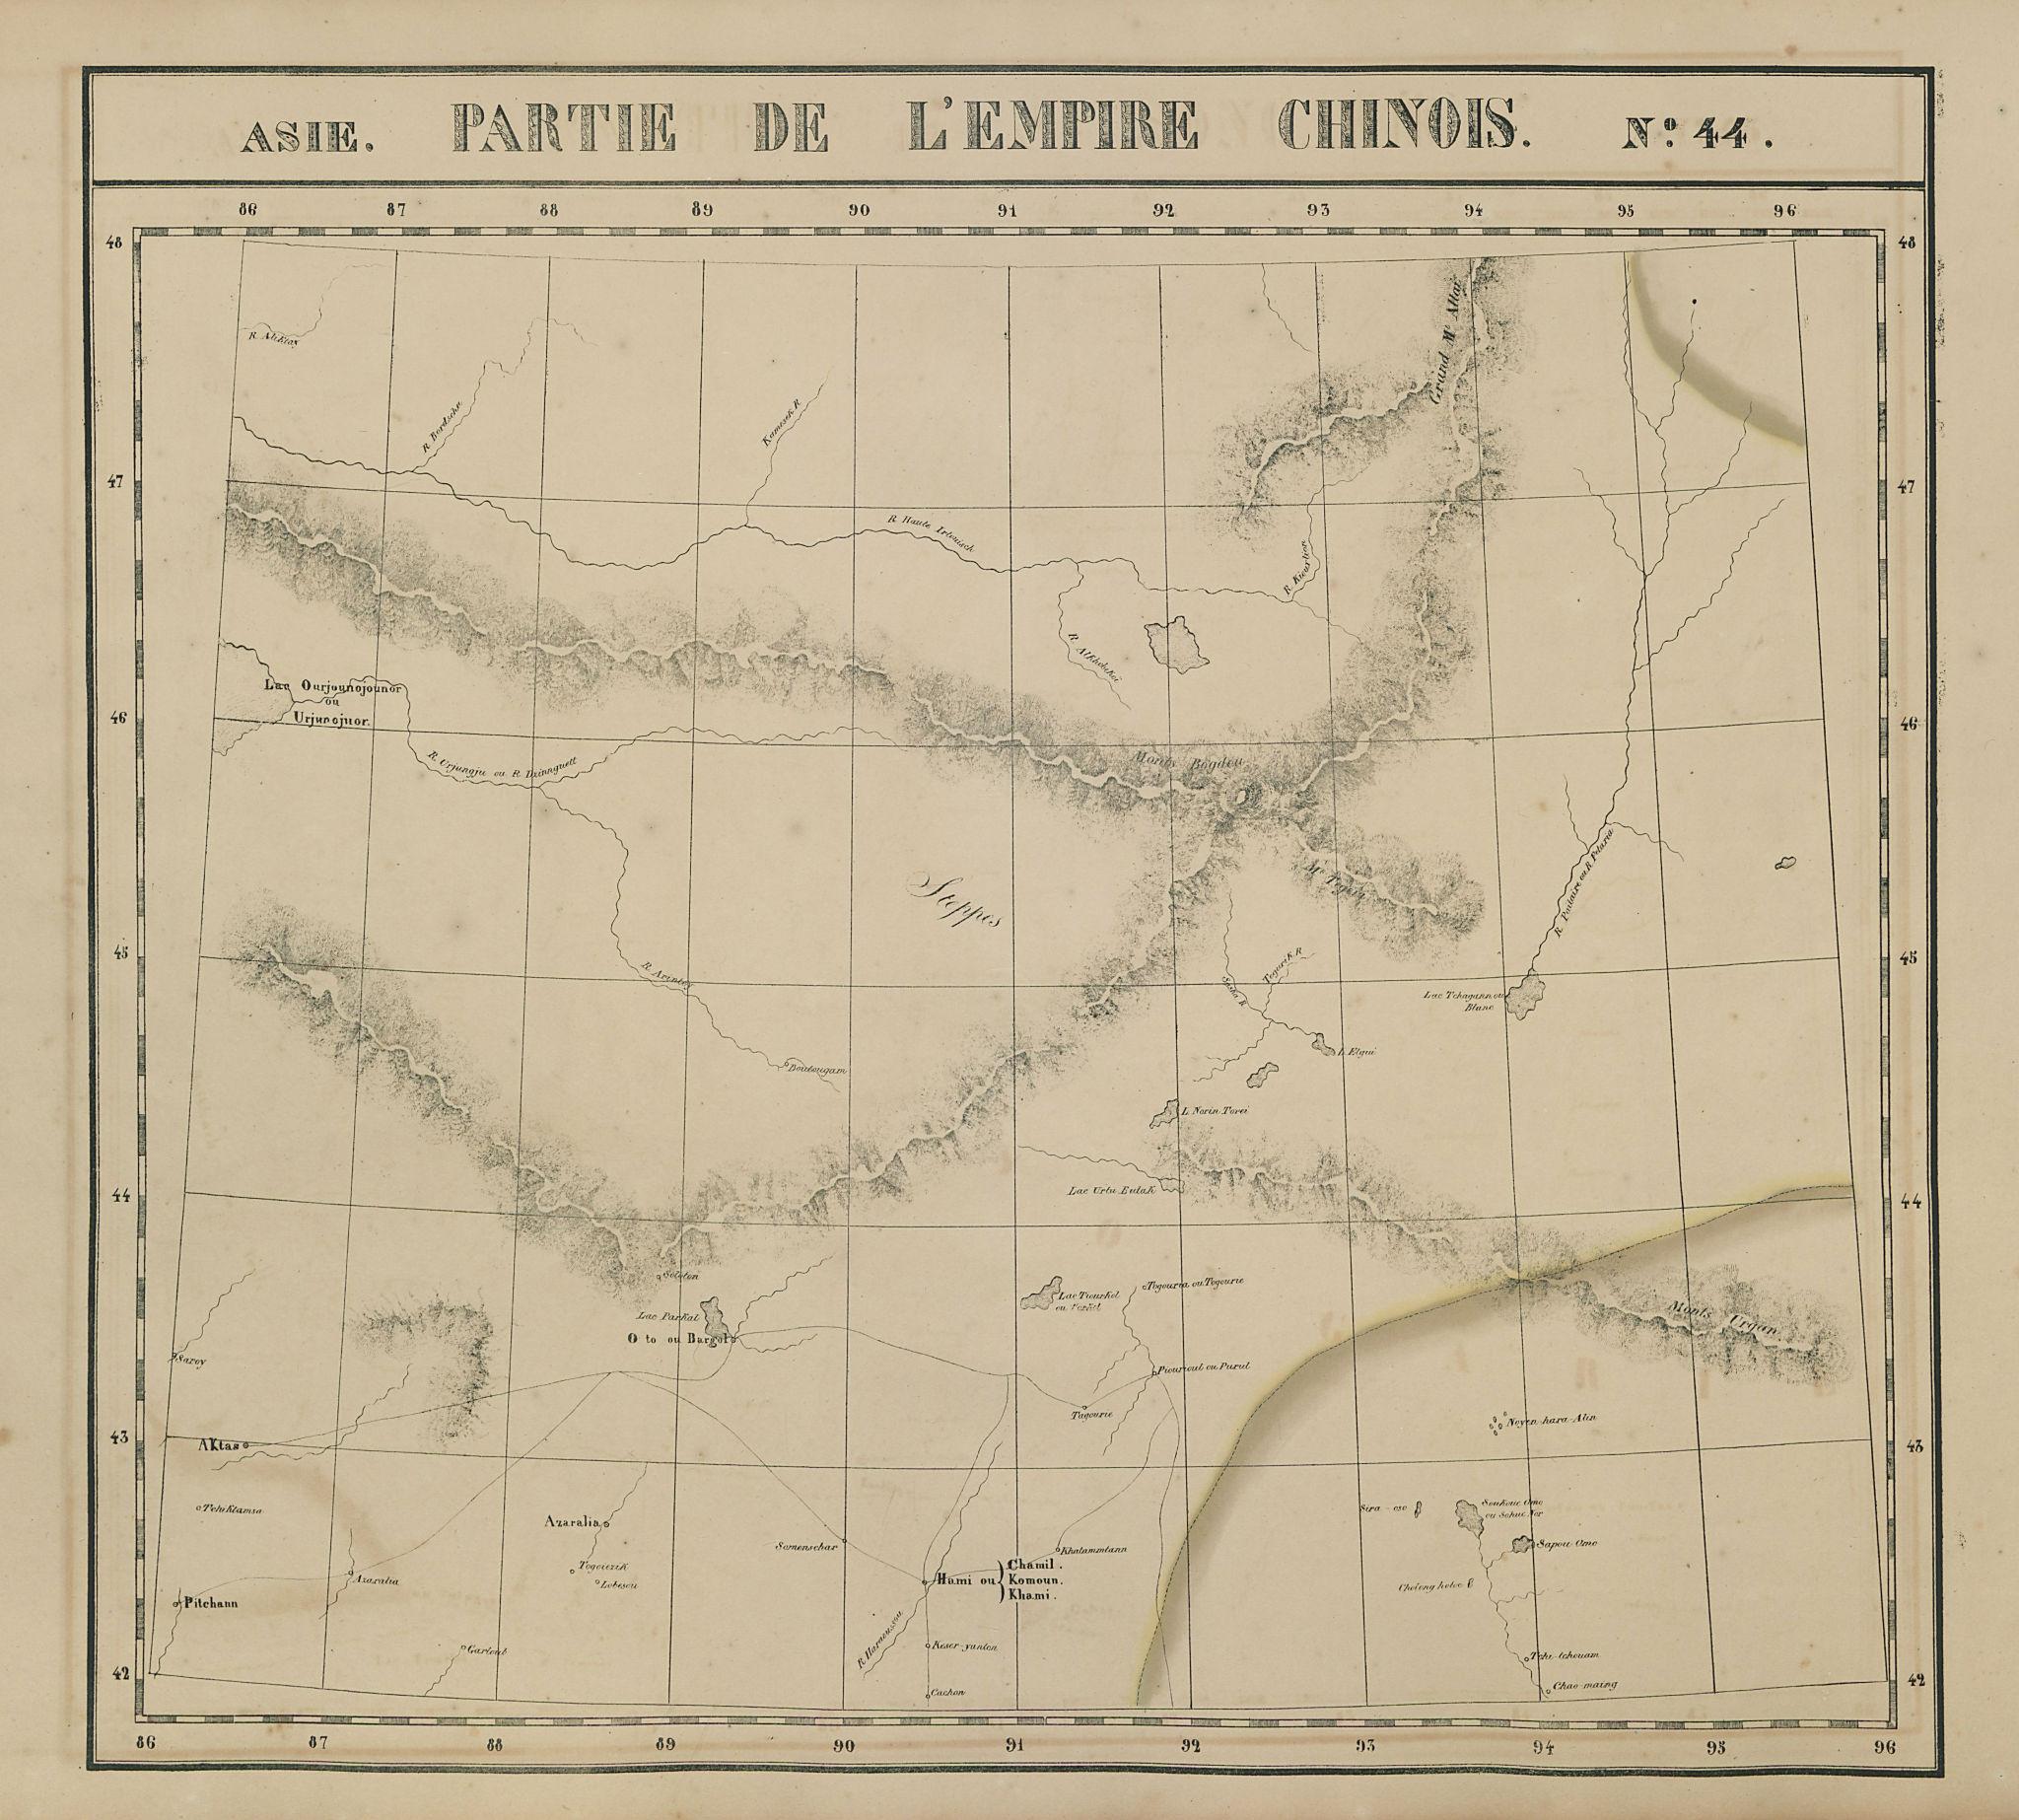 Asie. Empire Chinois #44 NW Xinjiang, China & SW Mongolia. VANDERMAELEN 1827 map